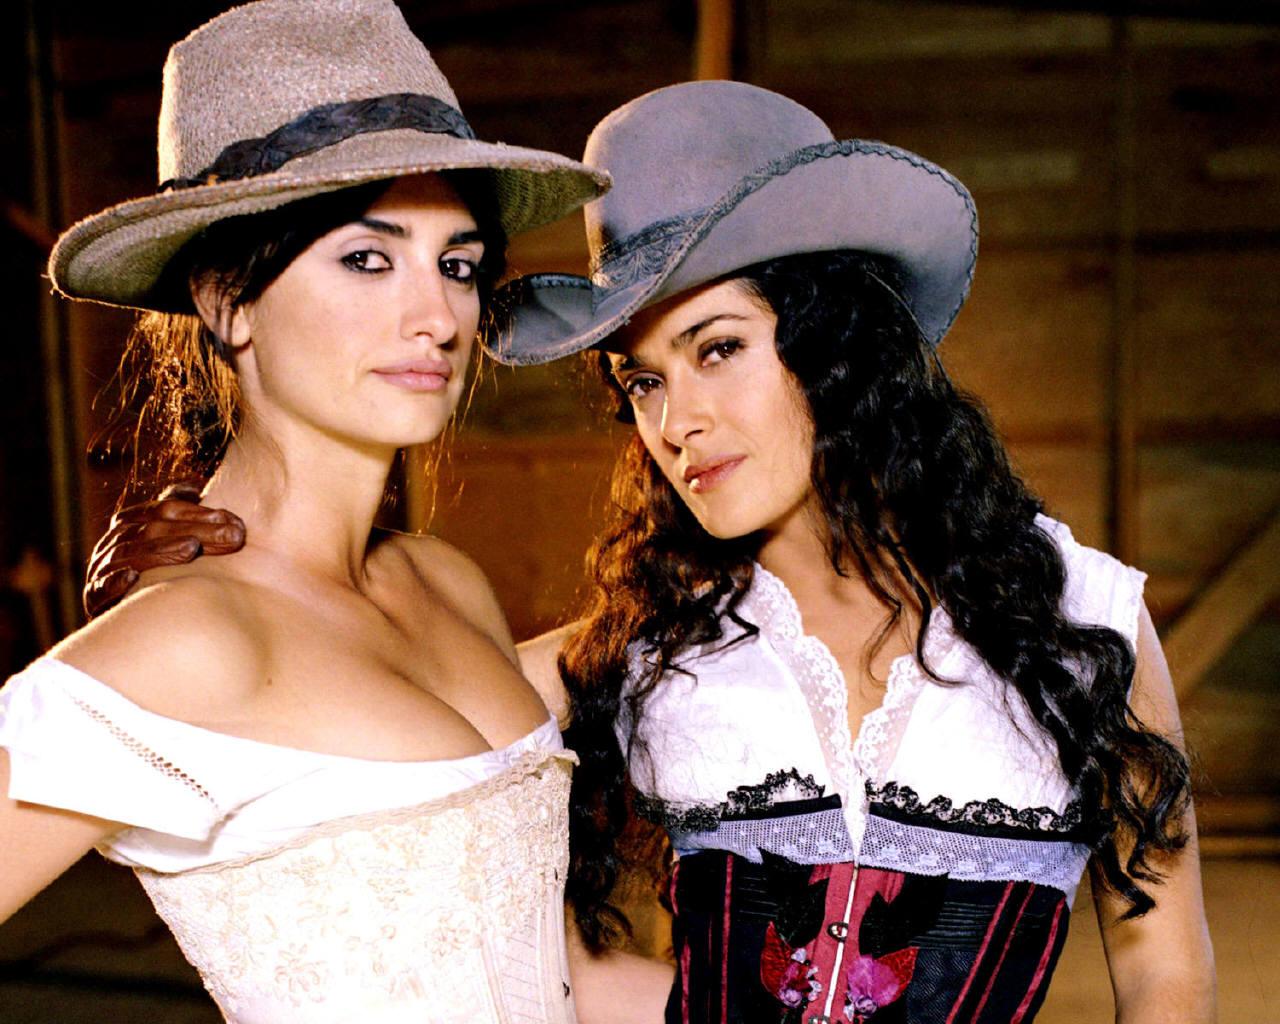 http://3.bp.blogspot.com/-lzBizqqGuZU/UPbfAyeo6qI/AAAAAAAAW5g/Pci3xJ8P96Y/s1600/LCDLA+Salma+Hayek+10.jpg